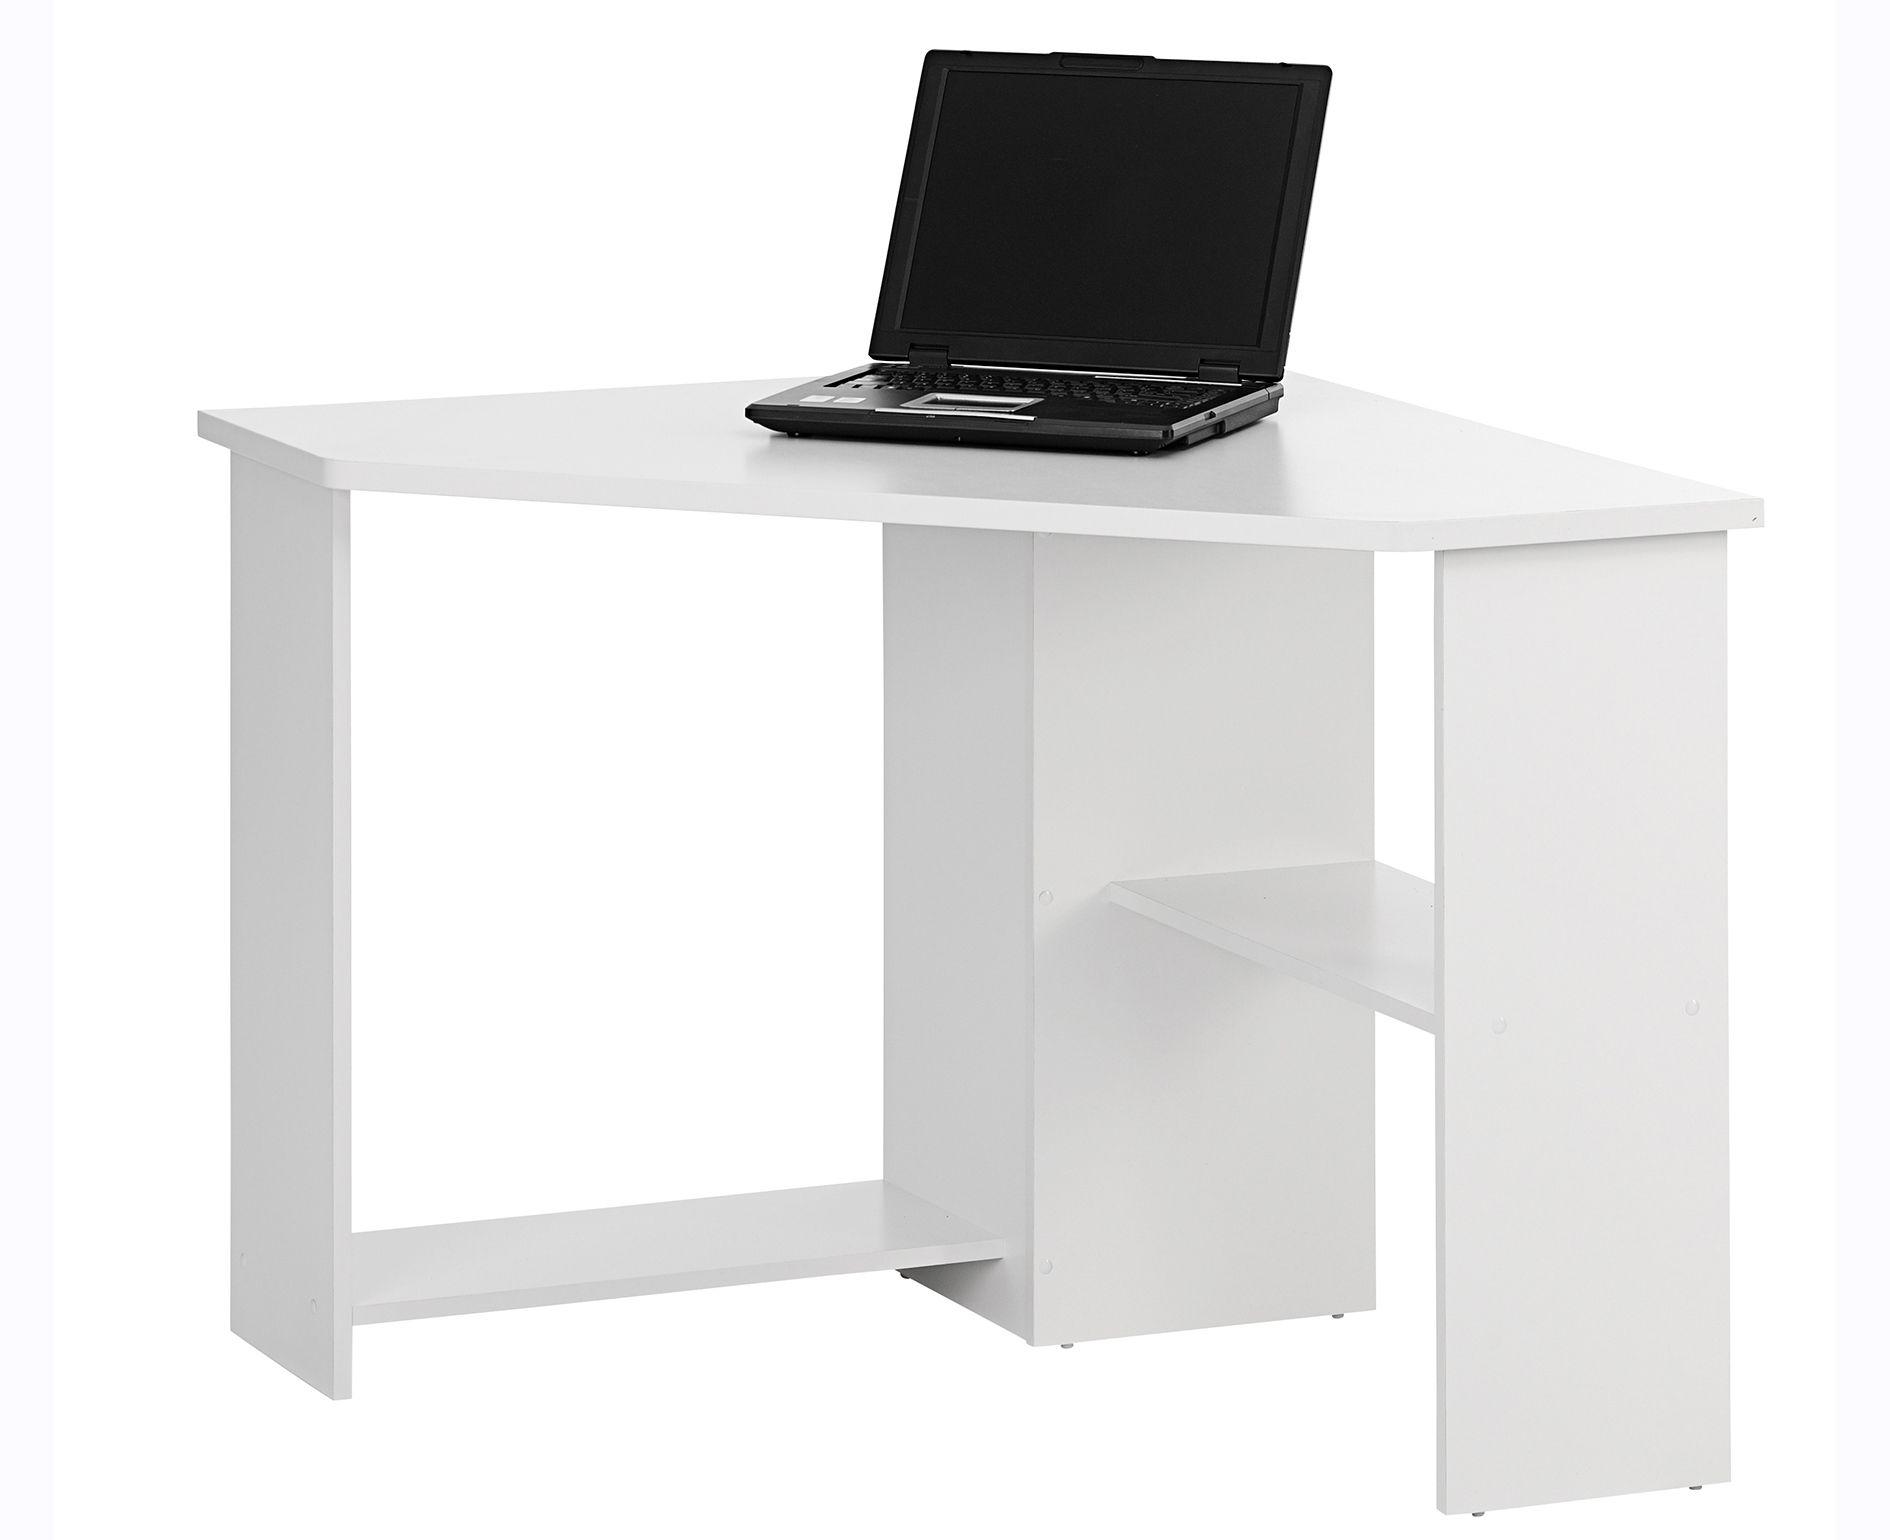 White Gloss Corner Desk Diy Stand Up Desk Check More At Http Www Gameintown Com White Gloss Computer Desks For Home Corner Computer Desk White Corner Desk